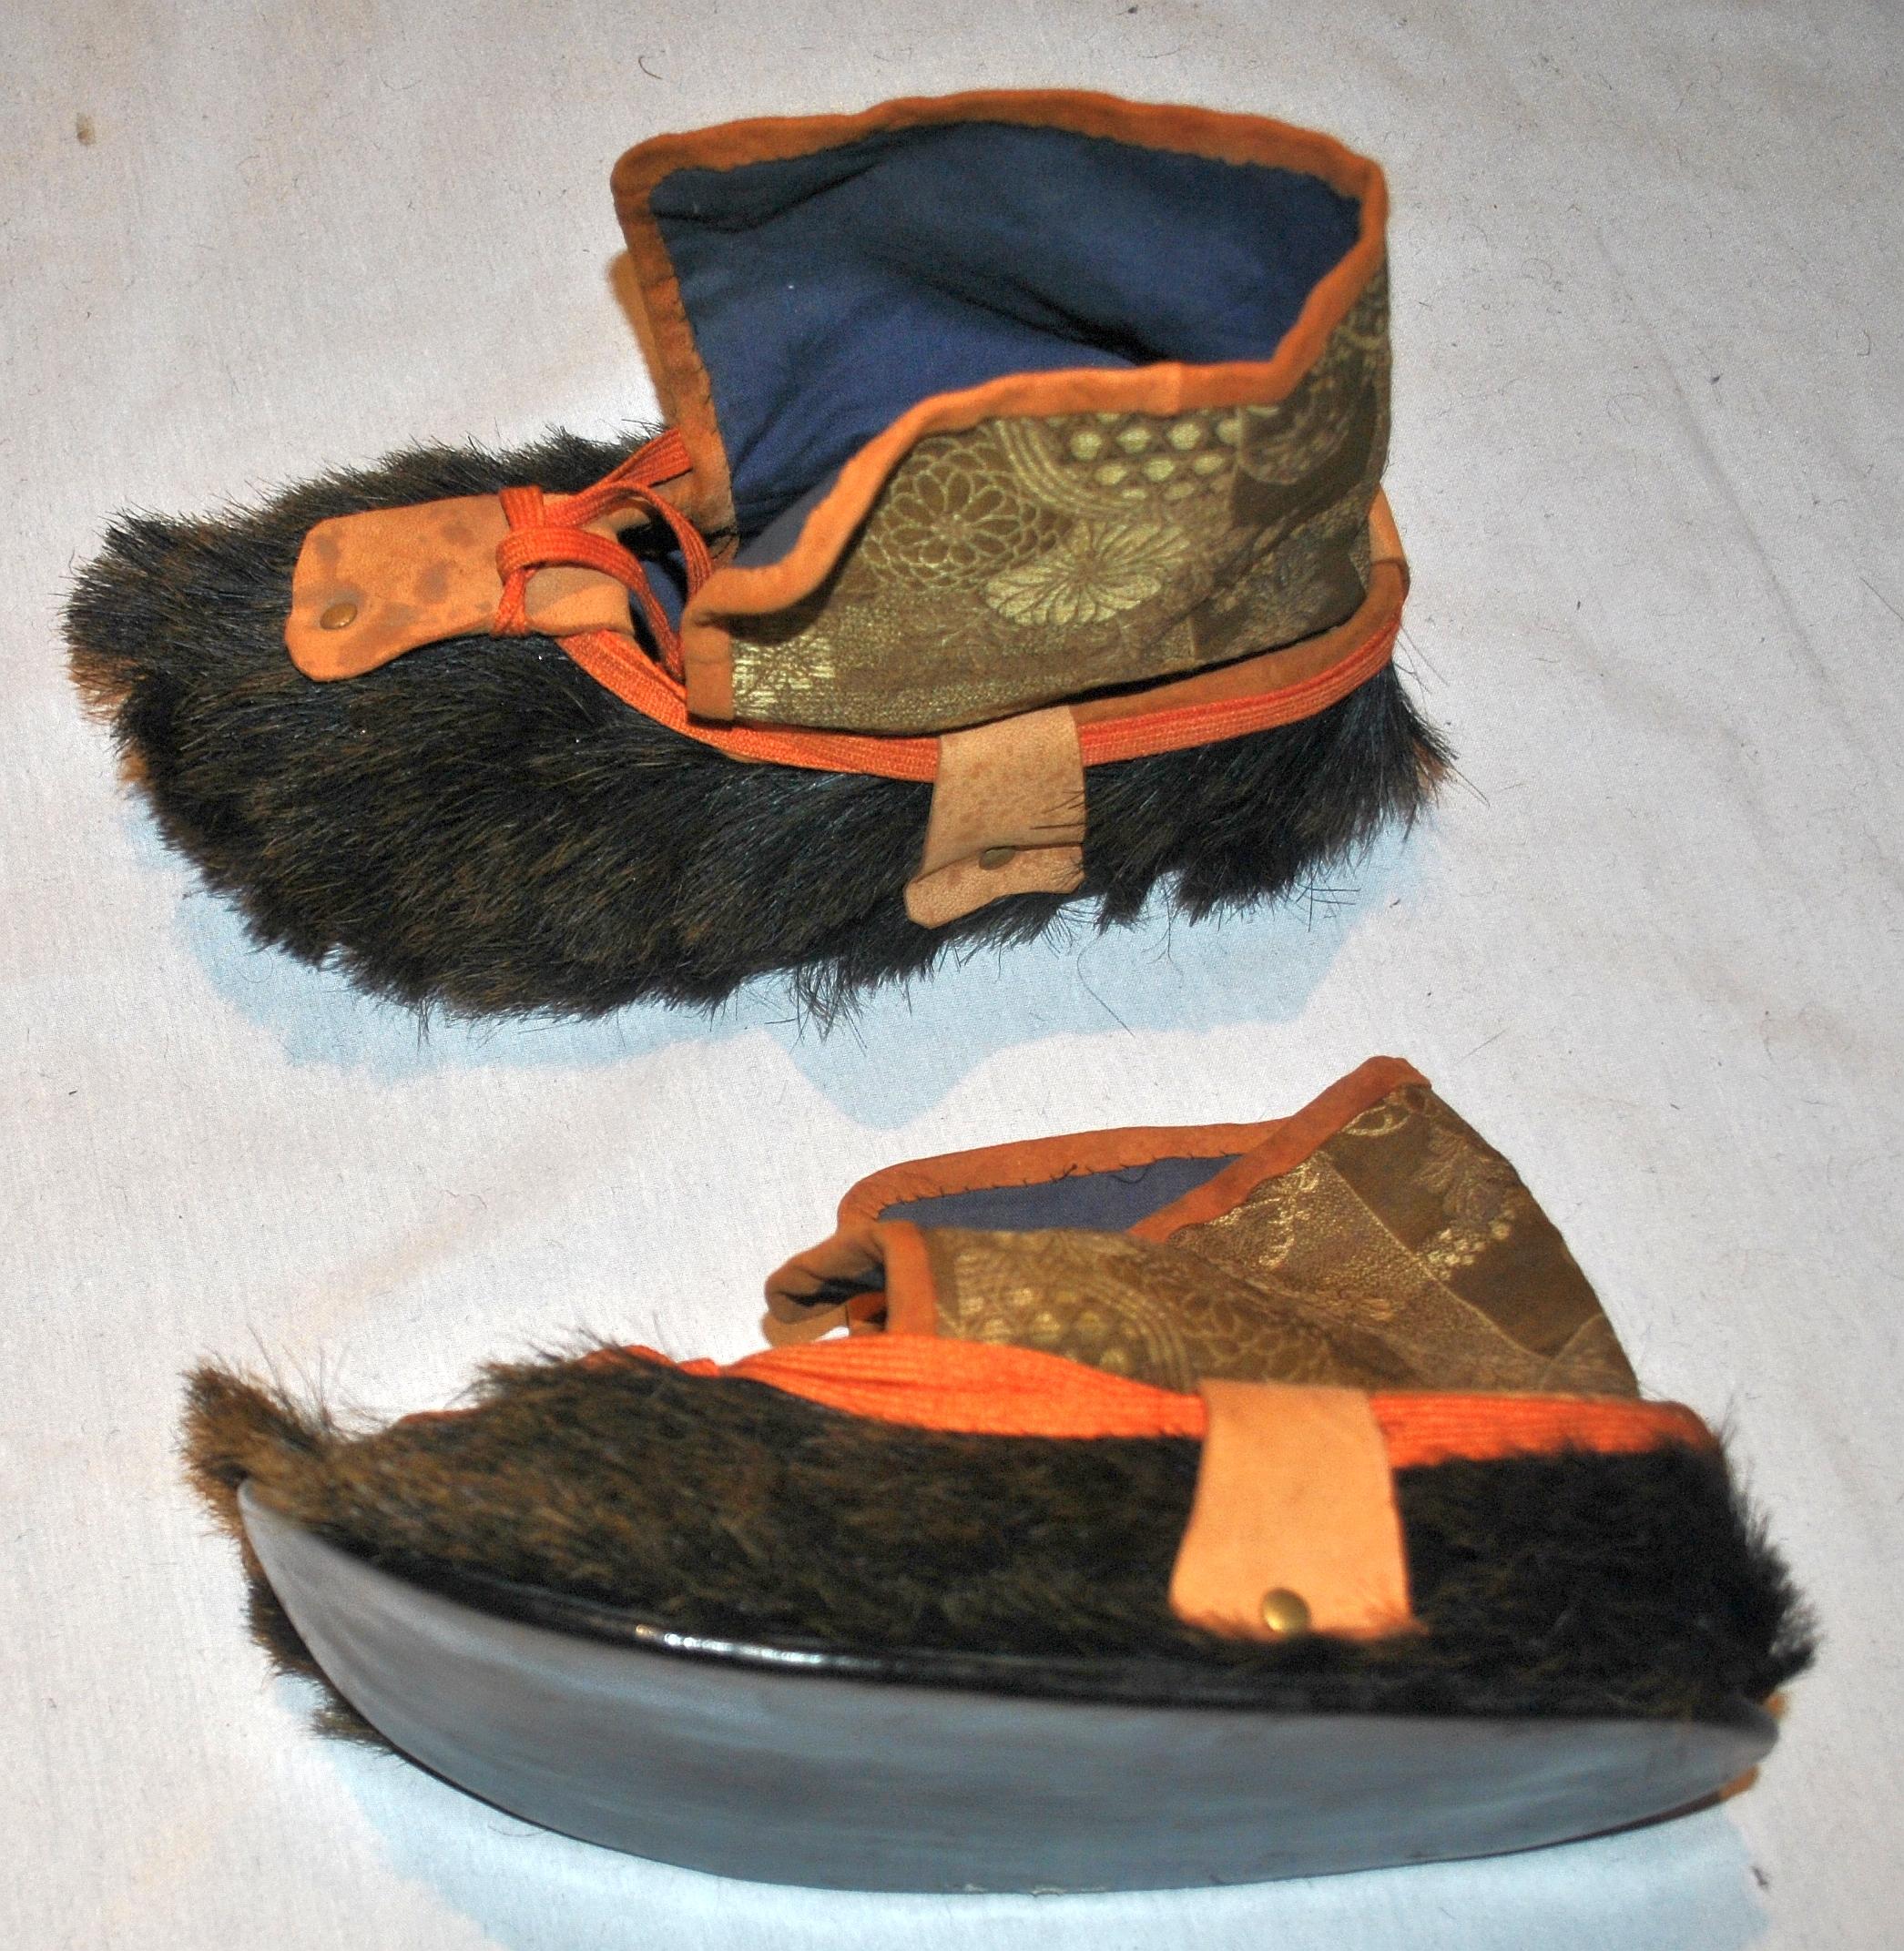 Japanese Shoe Size To Canadian